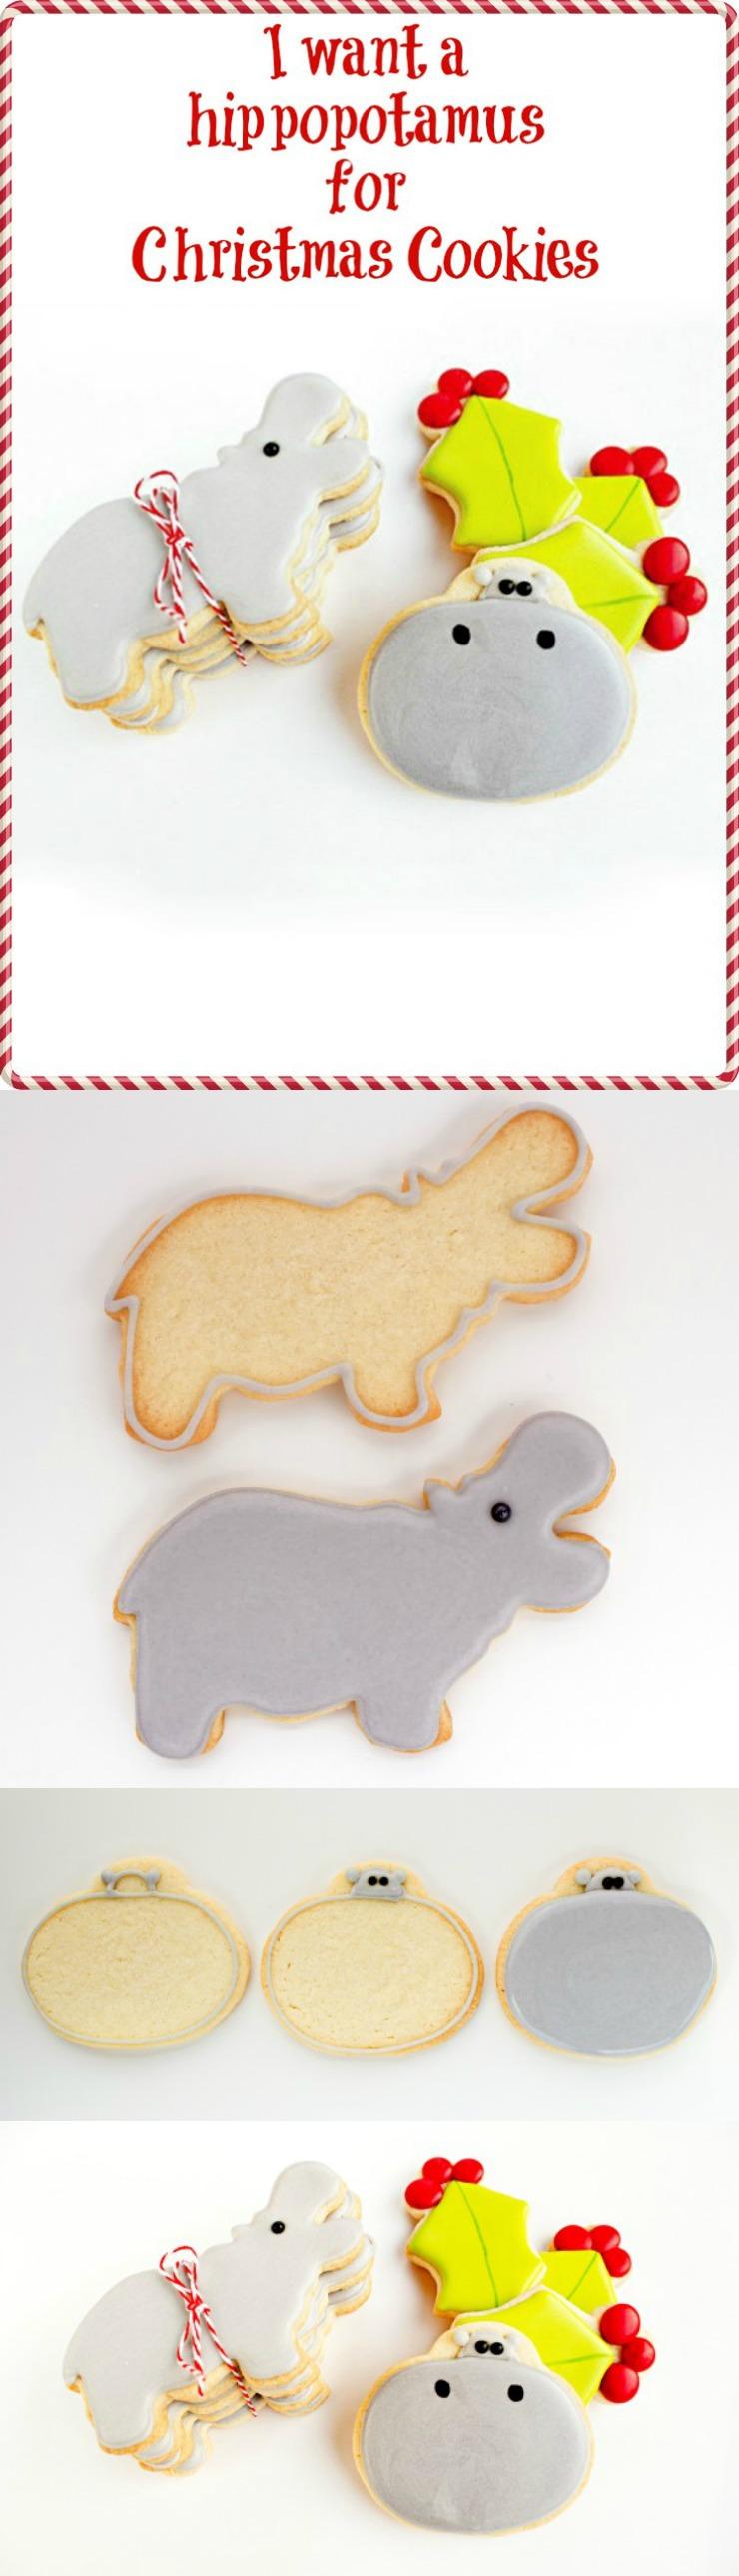 I want a Hippopotamus for Christmas Cookies | The Bearfoot Baker